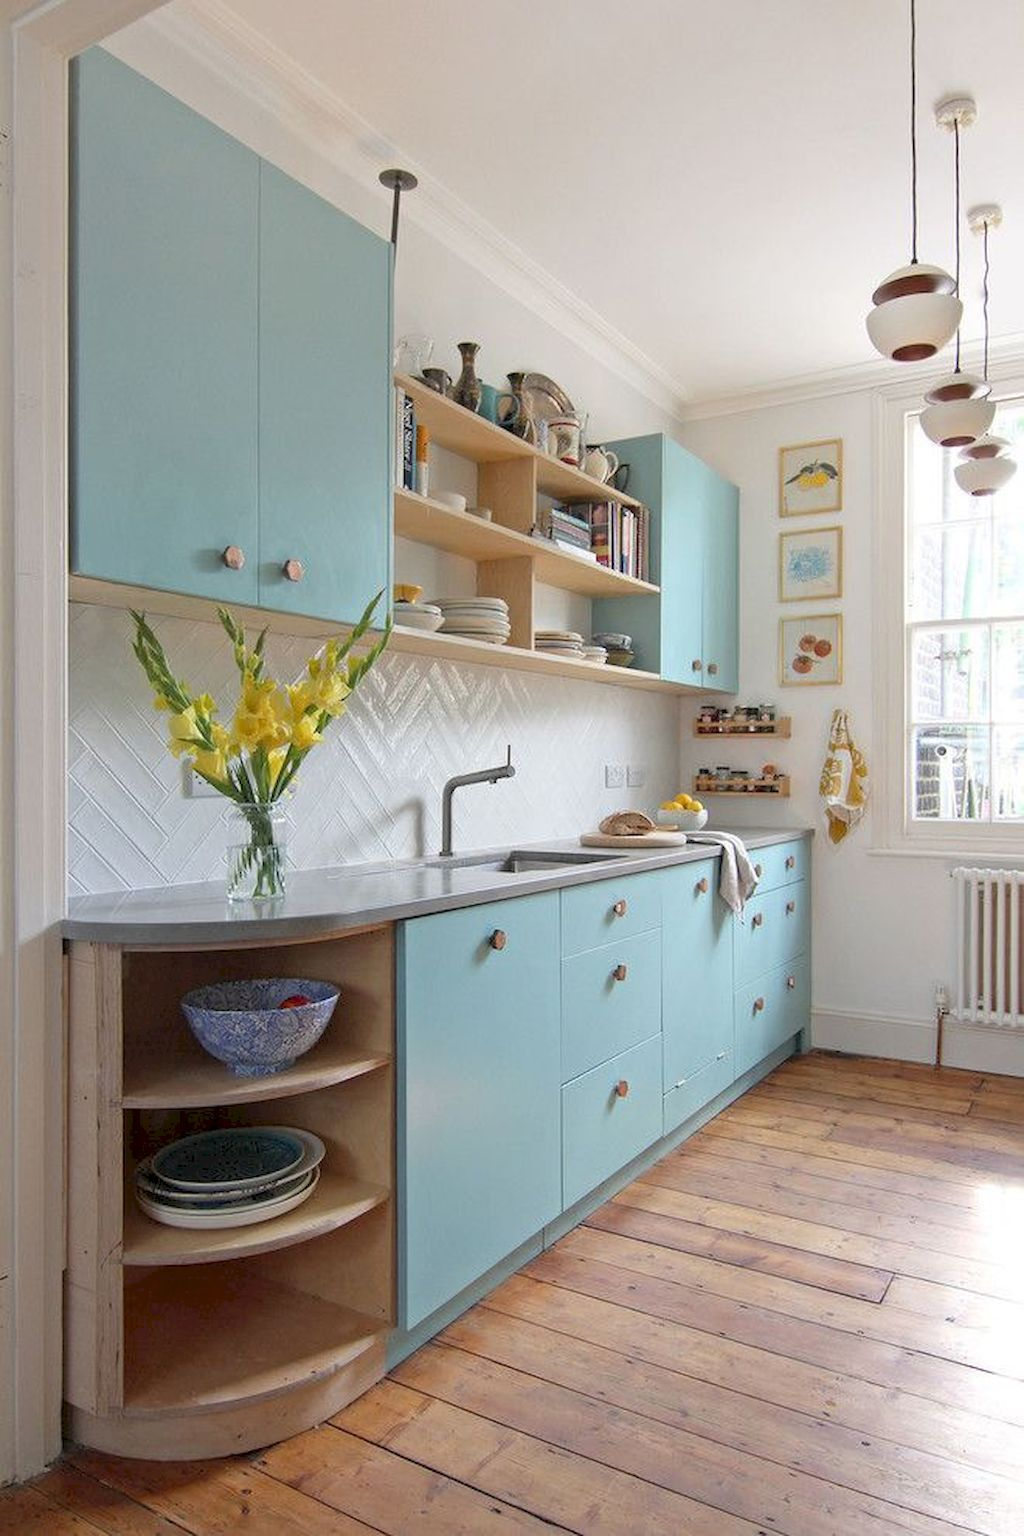 100+ Small Scandinavian Kitchen Design | Backsplash ideas, Kitchens ...